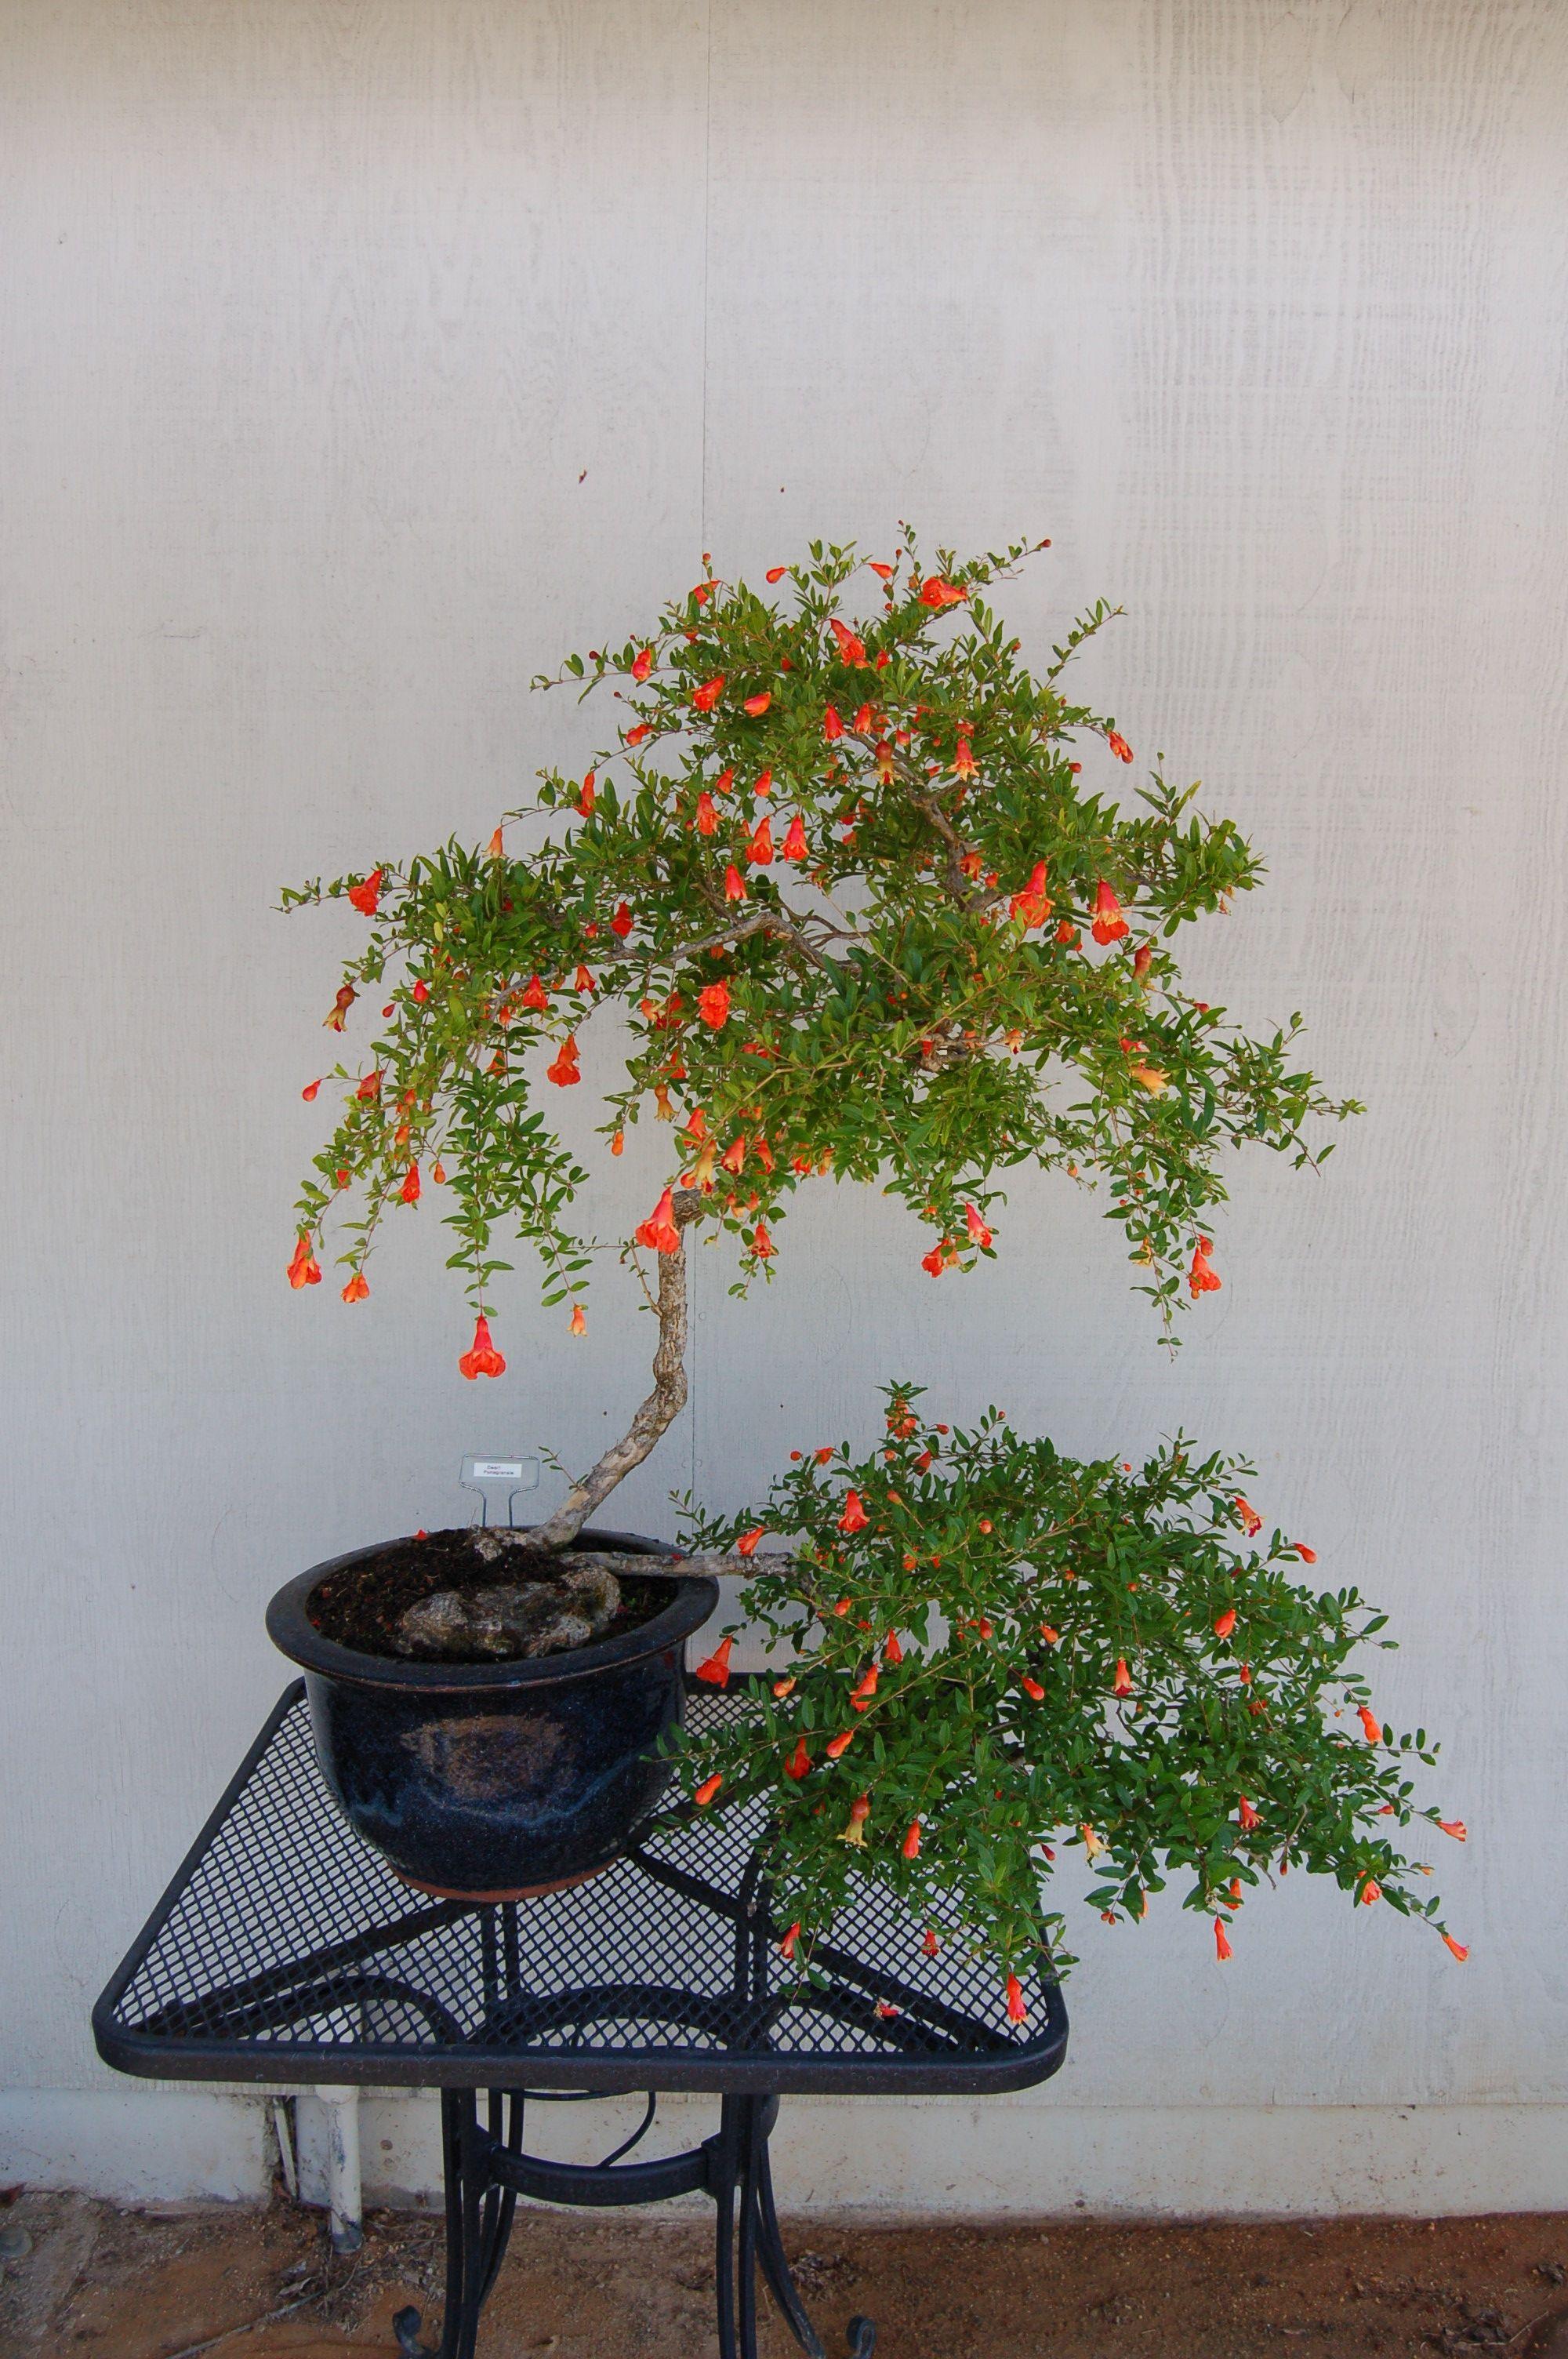 Bonsai Of The Month Dwarf Pomegranate Master Yo Cherry Blossom Bonsai Tree Bonsai Indoor Bonsai Tree